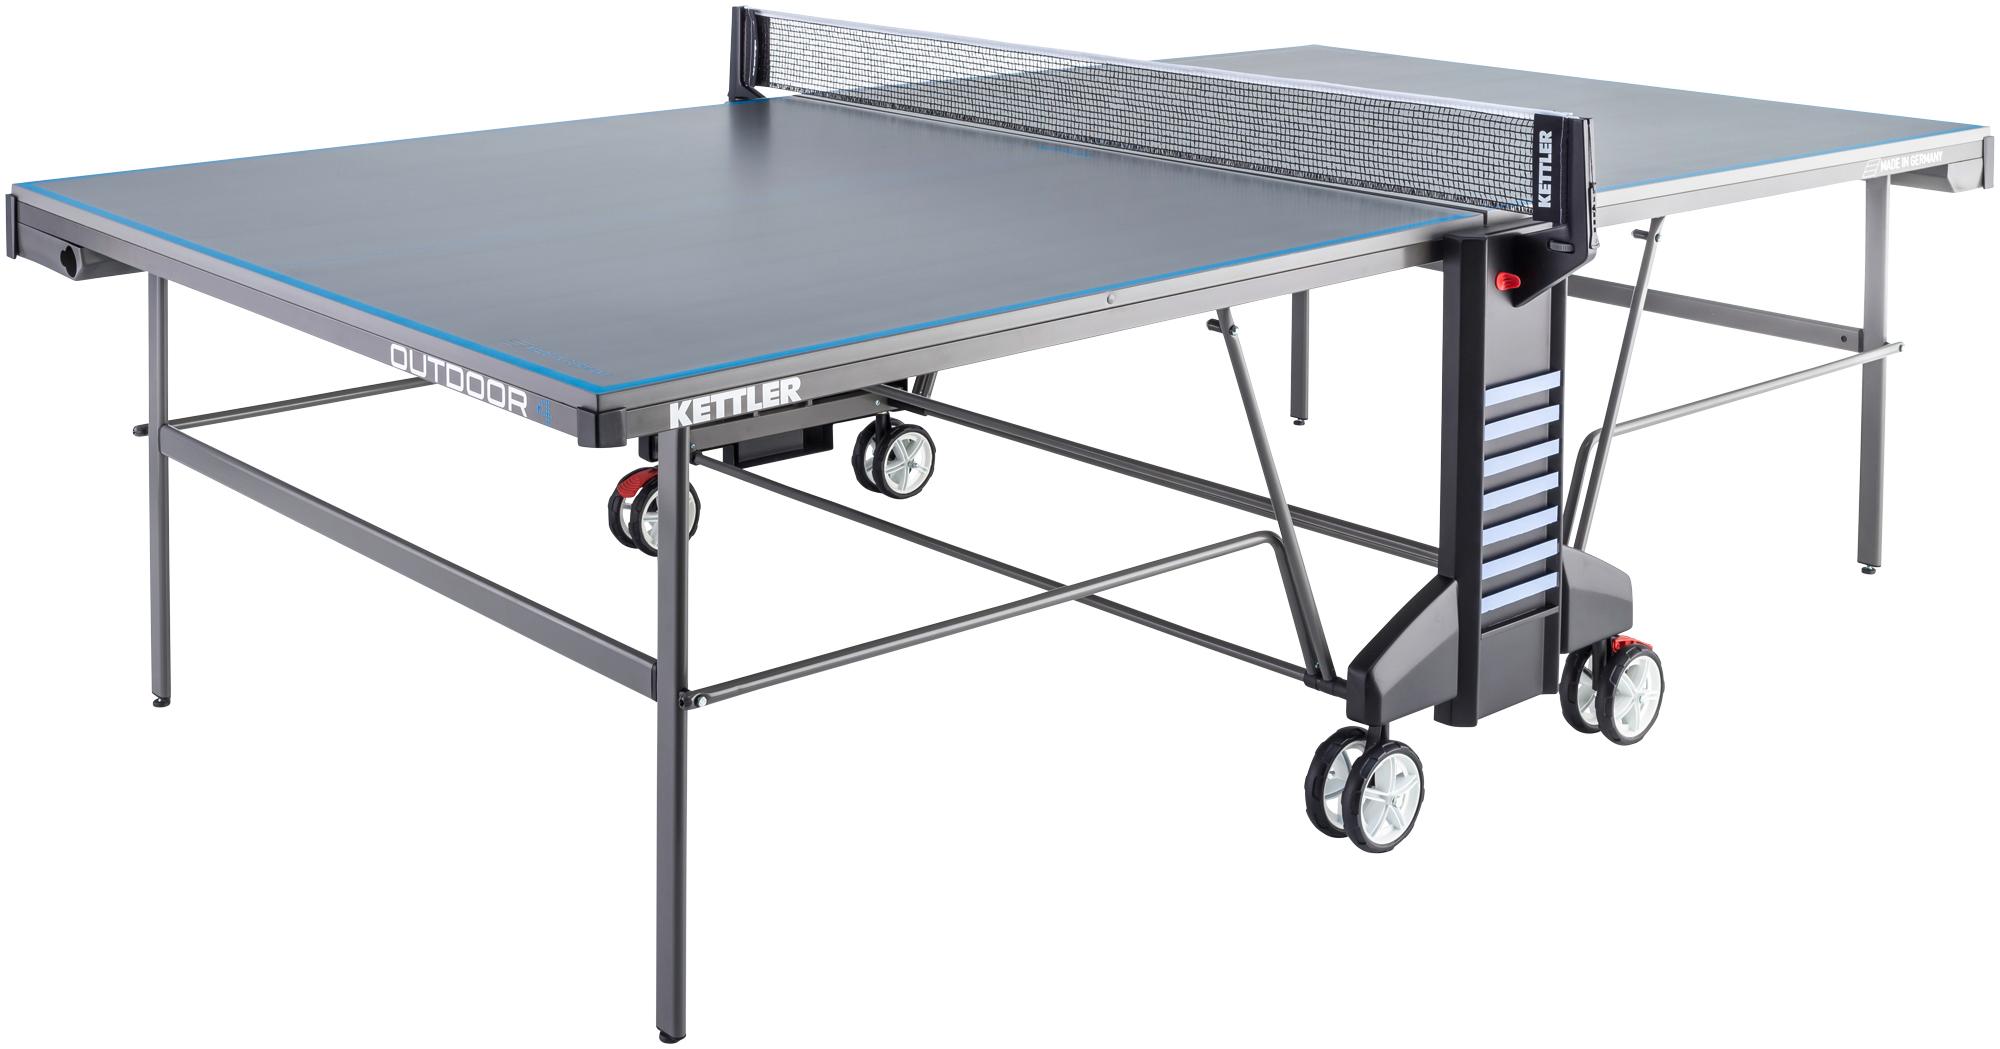 Kettler Теннисный стол Kettler Outdoor 4